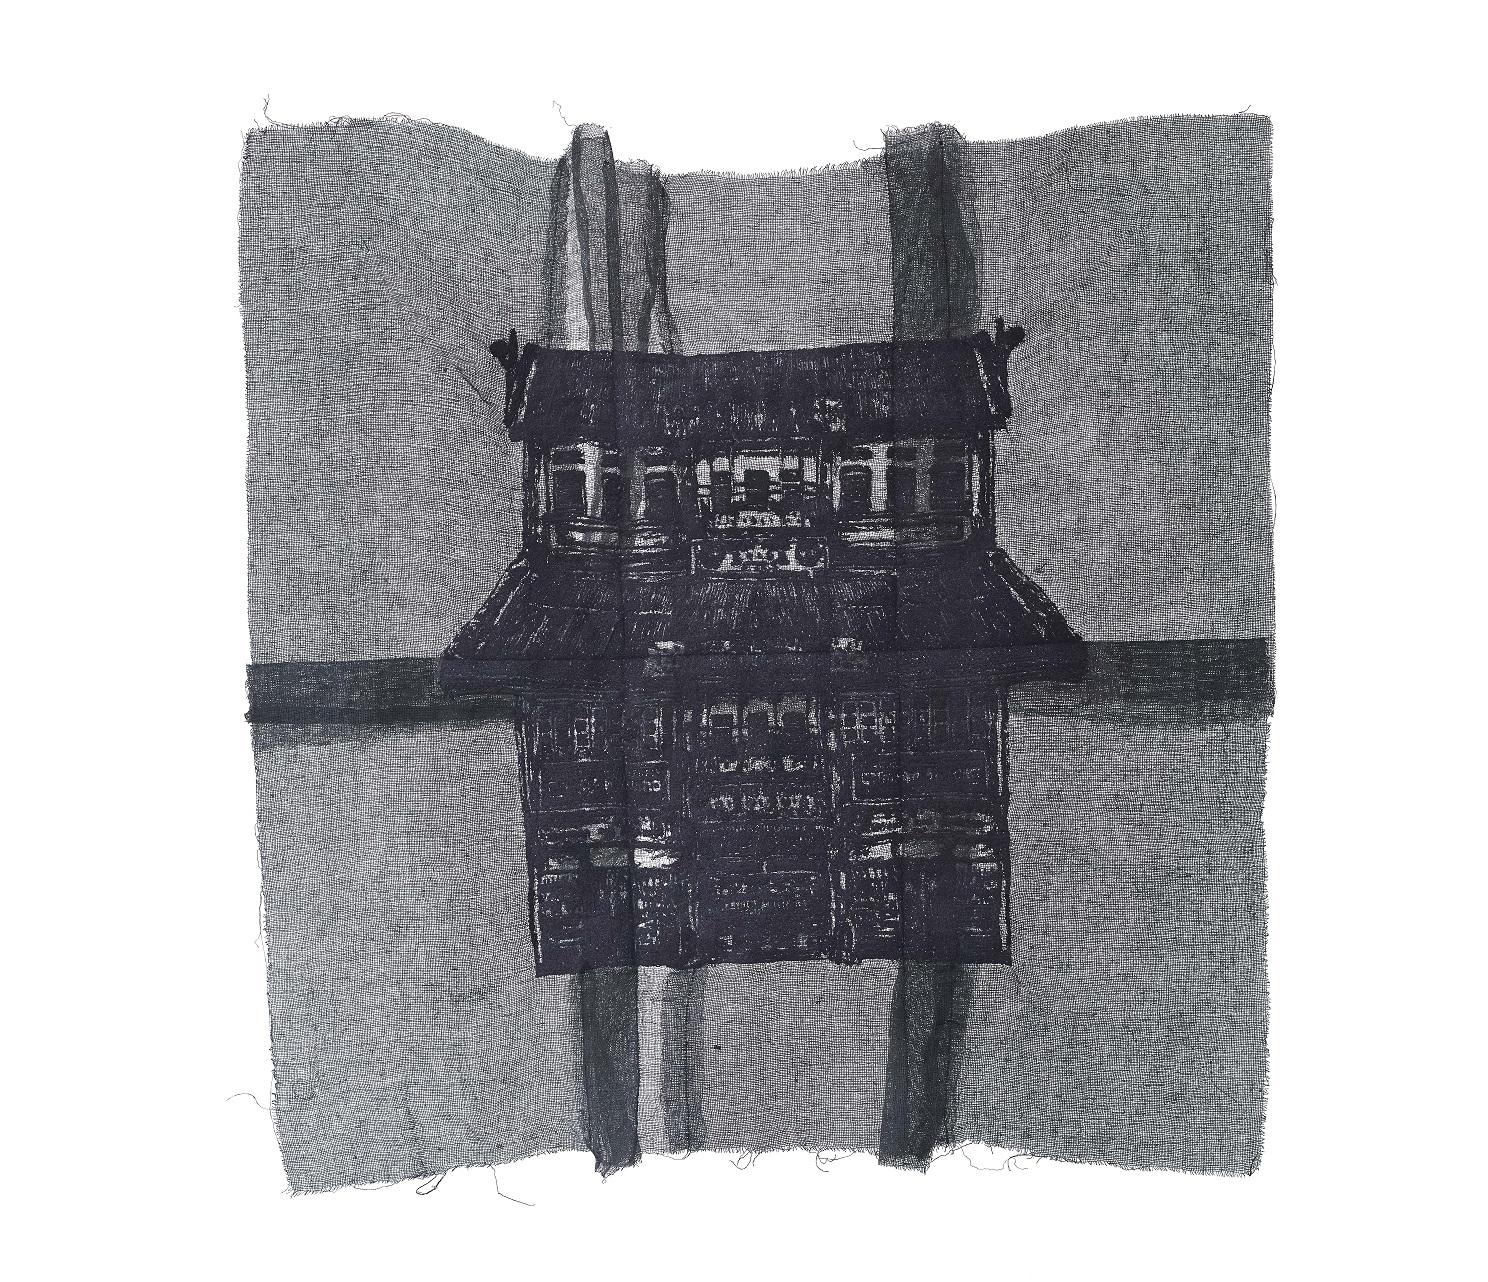 Yim Yen Sum - We Share The Same Ground III (2018) Embroidery on gauze, gauze dyed in acrylic; 58cm(H) x 58cm(W)